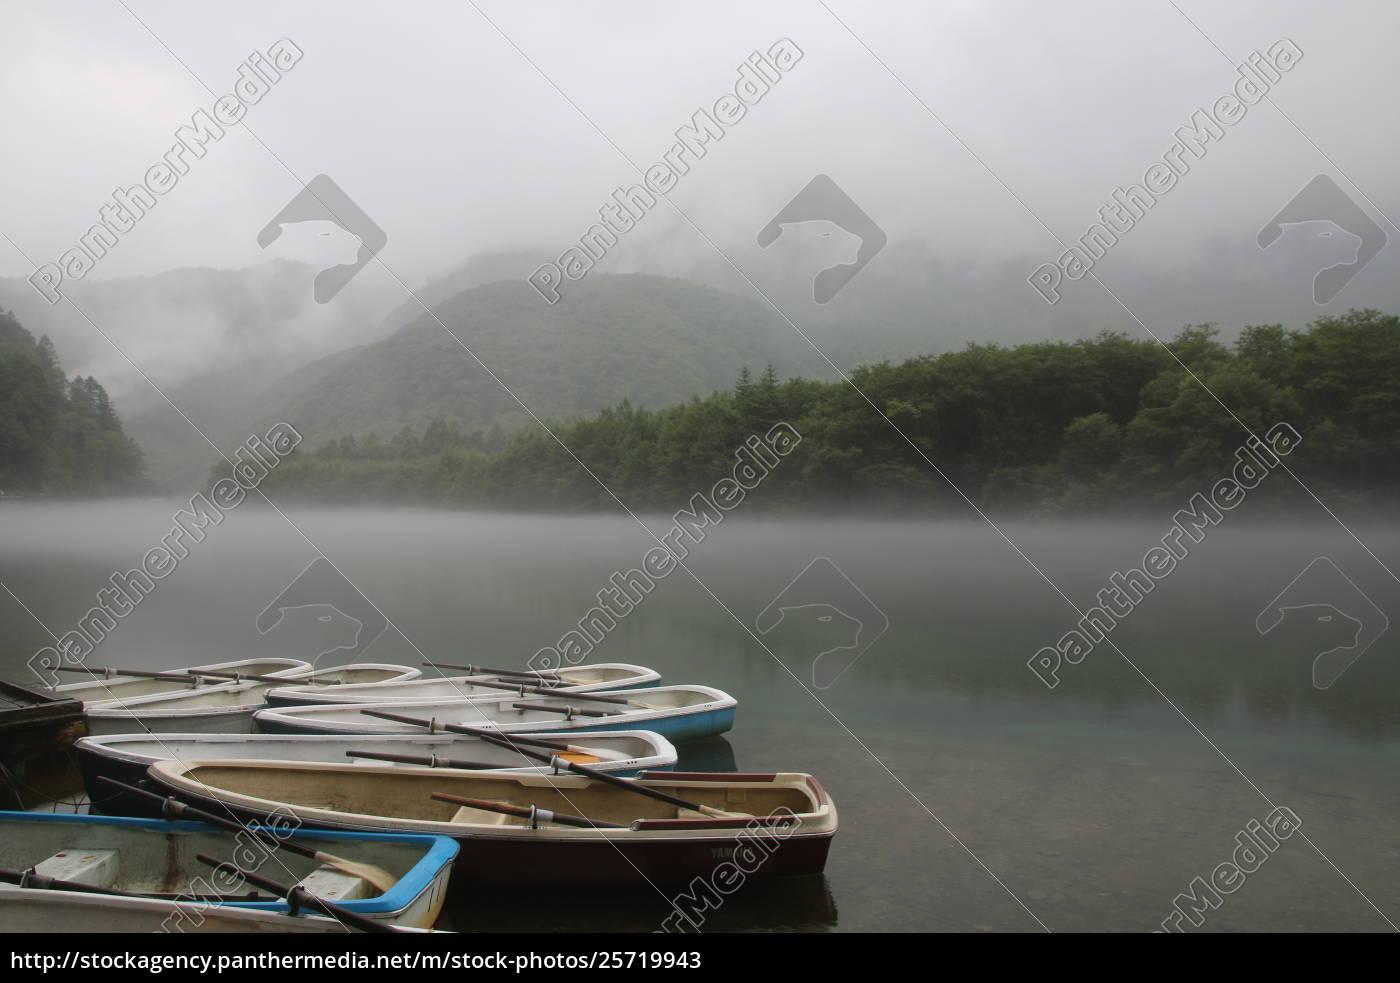 canoe, besides, the, deck - 25719943